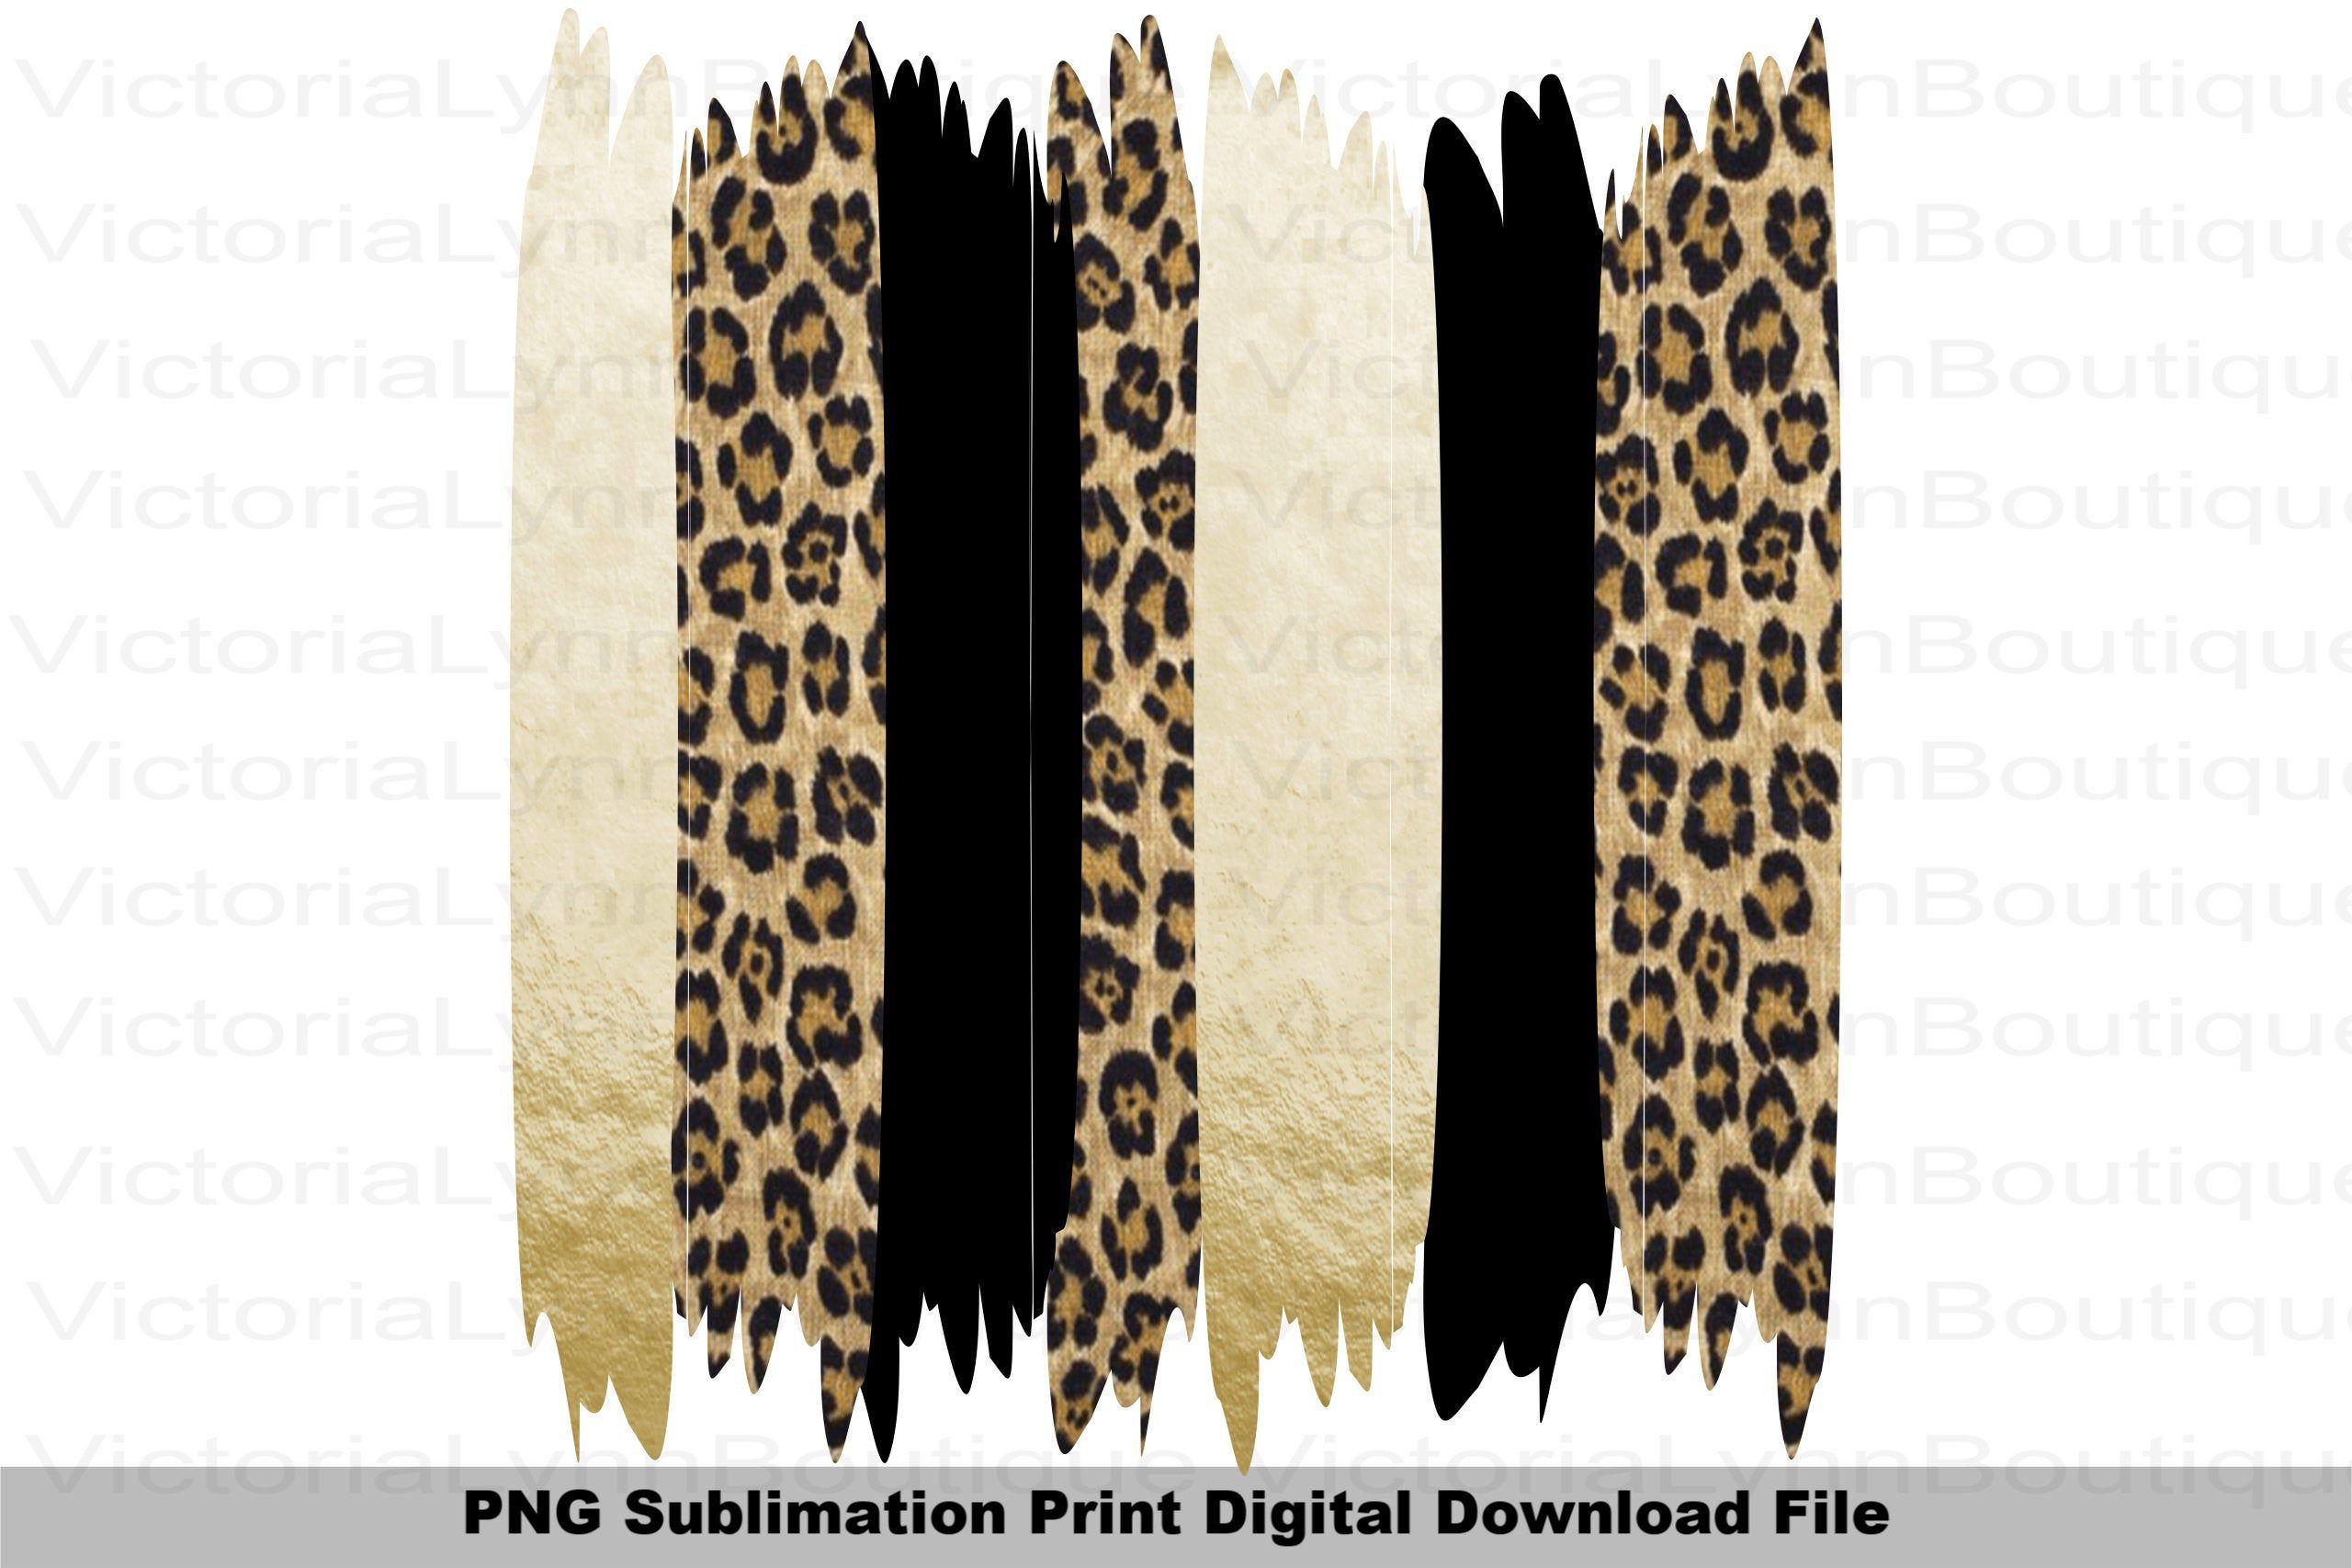 8 png clip art designs instant download 300 dpi brush strokes beige glitter neutrals tiger cow 8 ROSE GOLD animal print BRUSHSTROKES